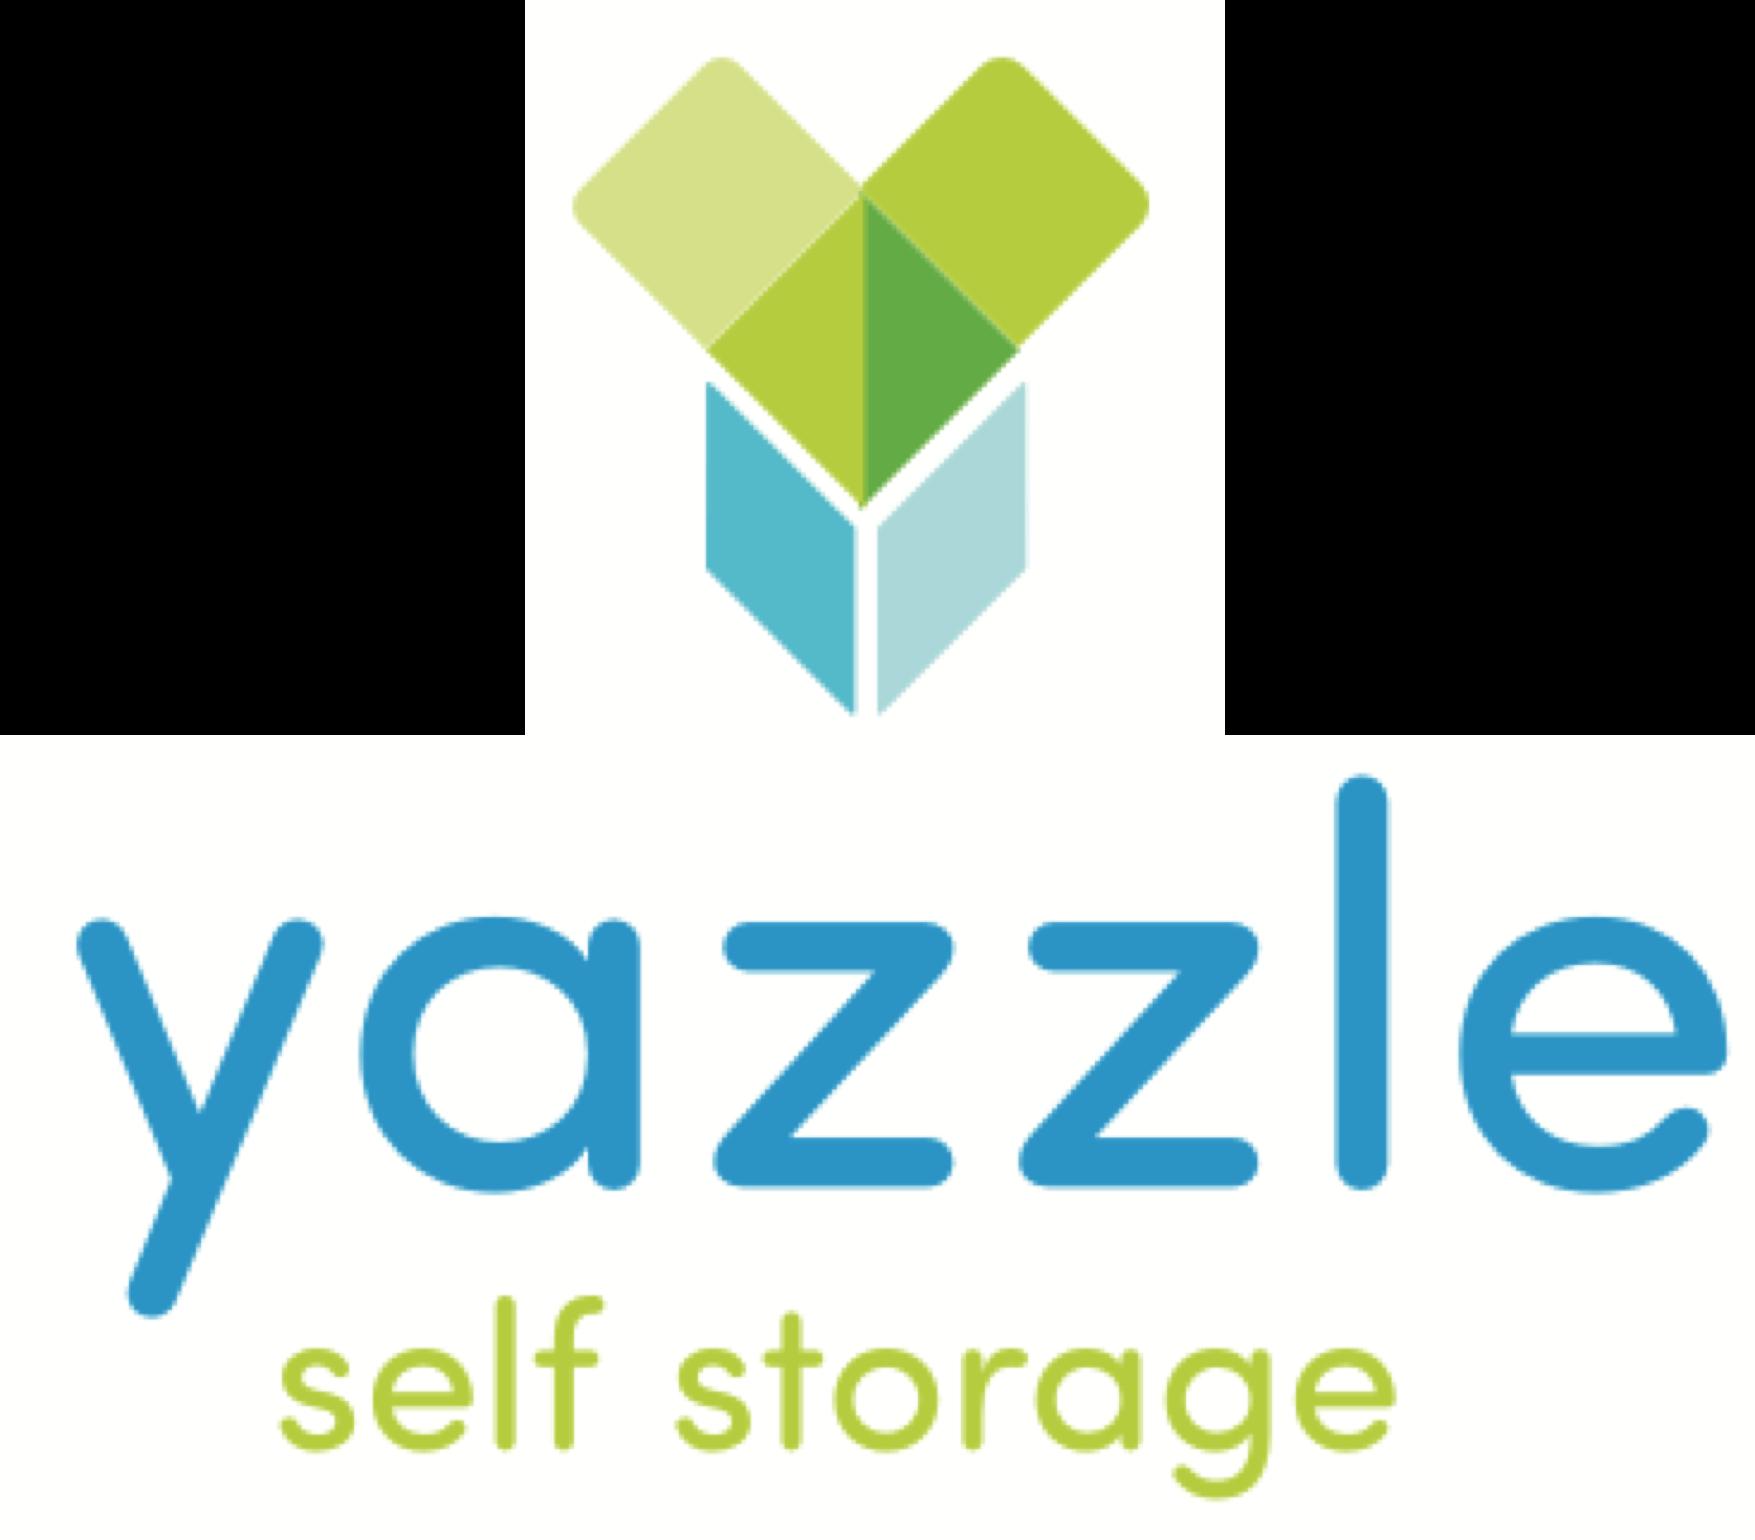 Yazzle-Self-Storage-Units-Website-Design-Logo